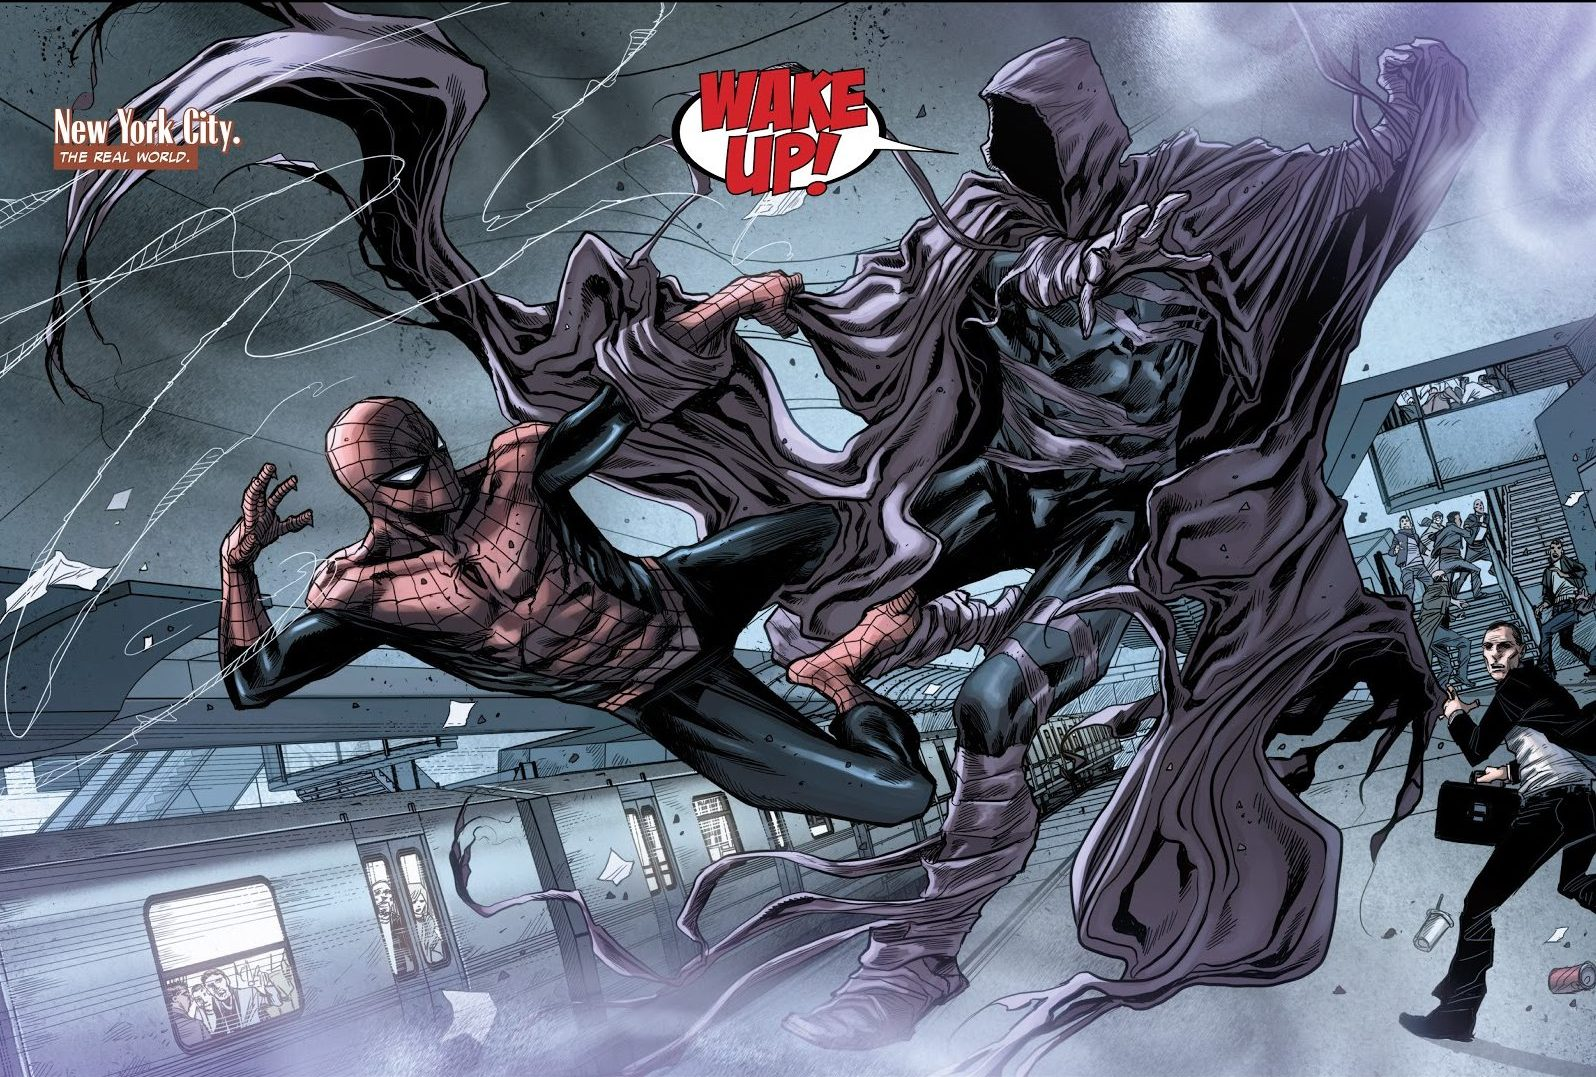 Superior Spider-Man VS Sleepwalker